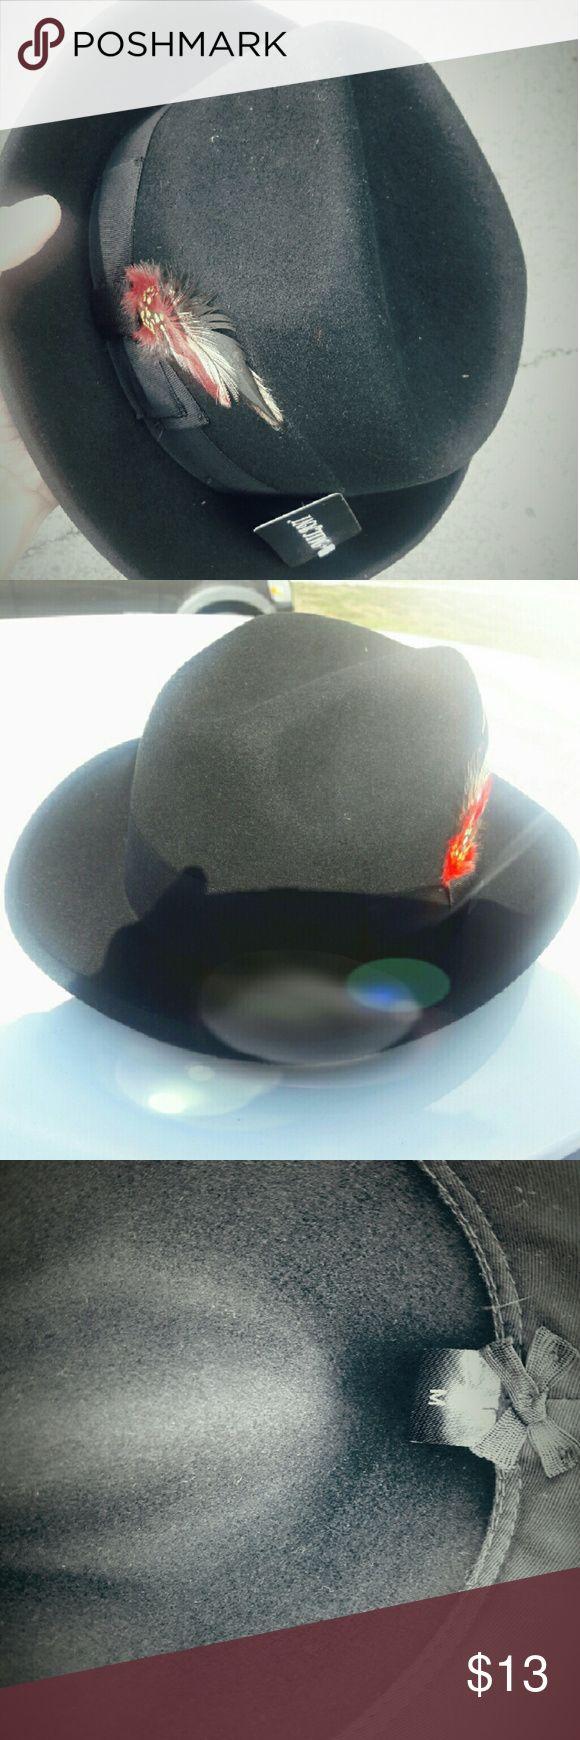 FEDORA HAT MILANI Old school   Black wool   mens FEDORA hat  Size: medium  56cm Milani Accessories Hats